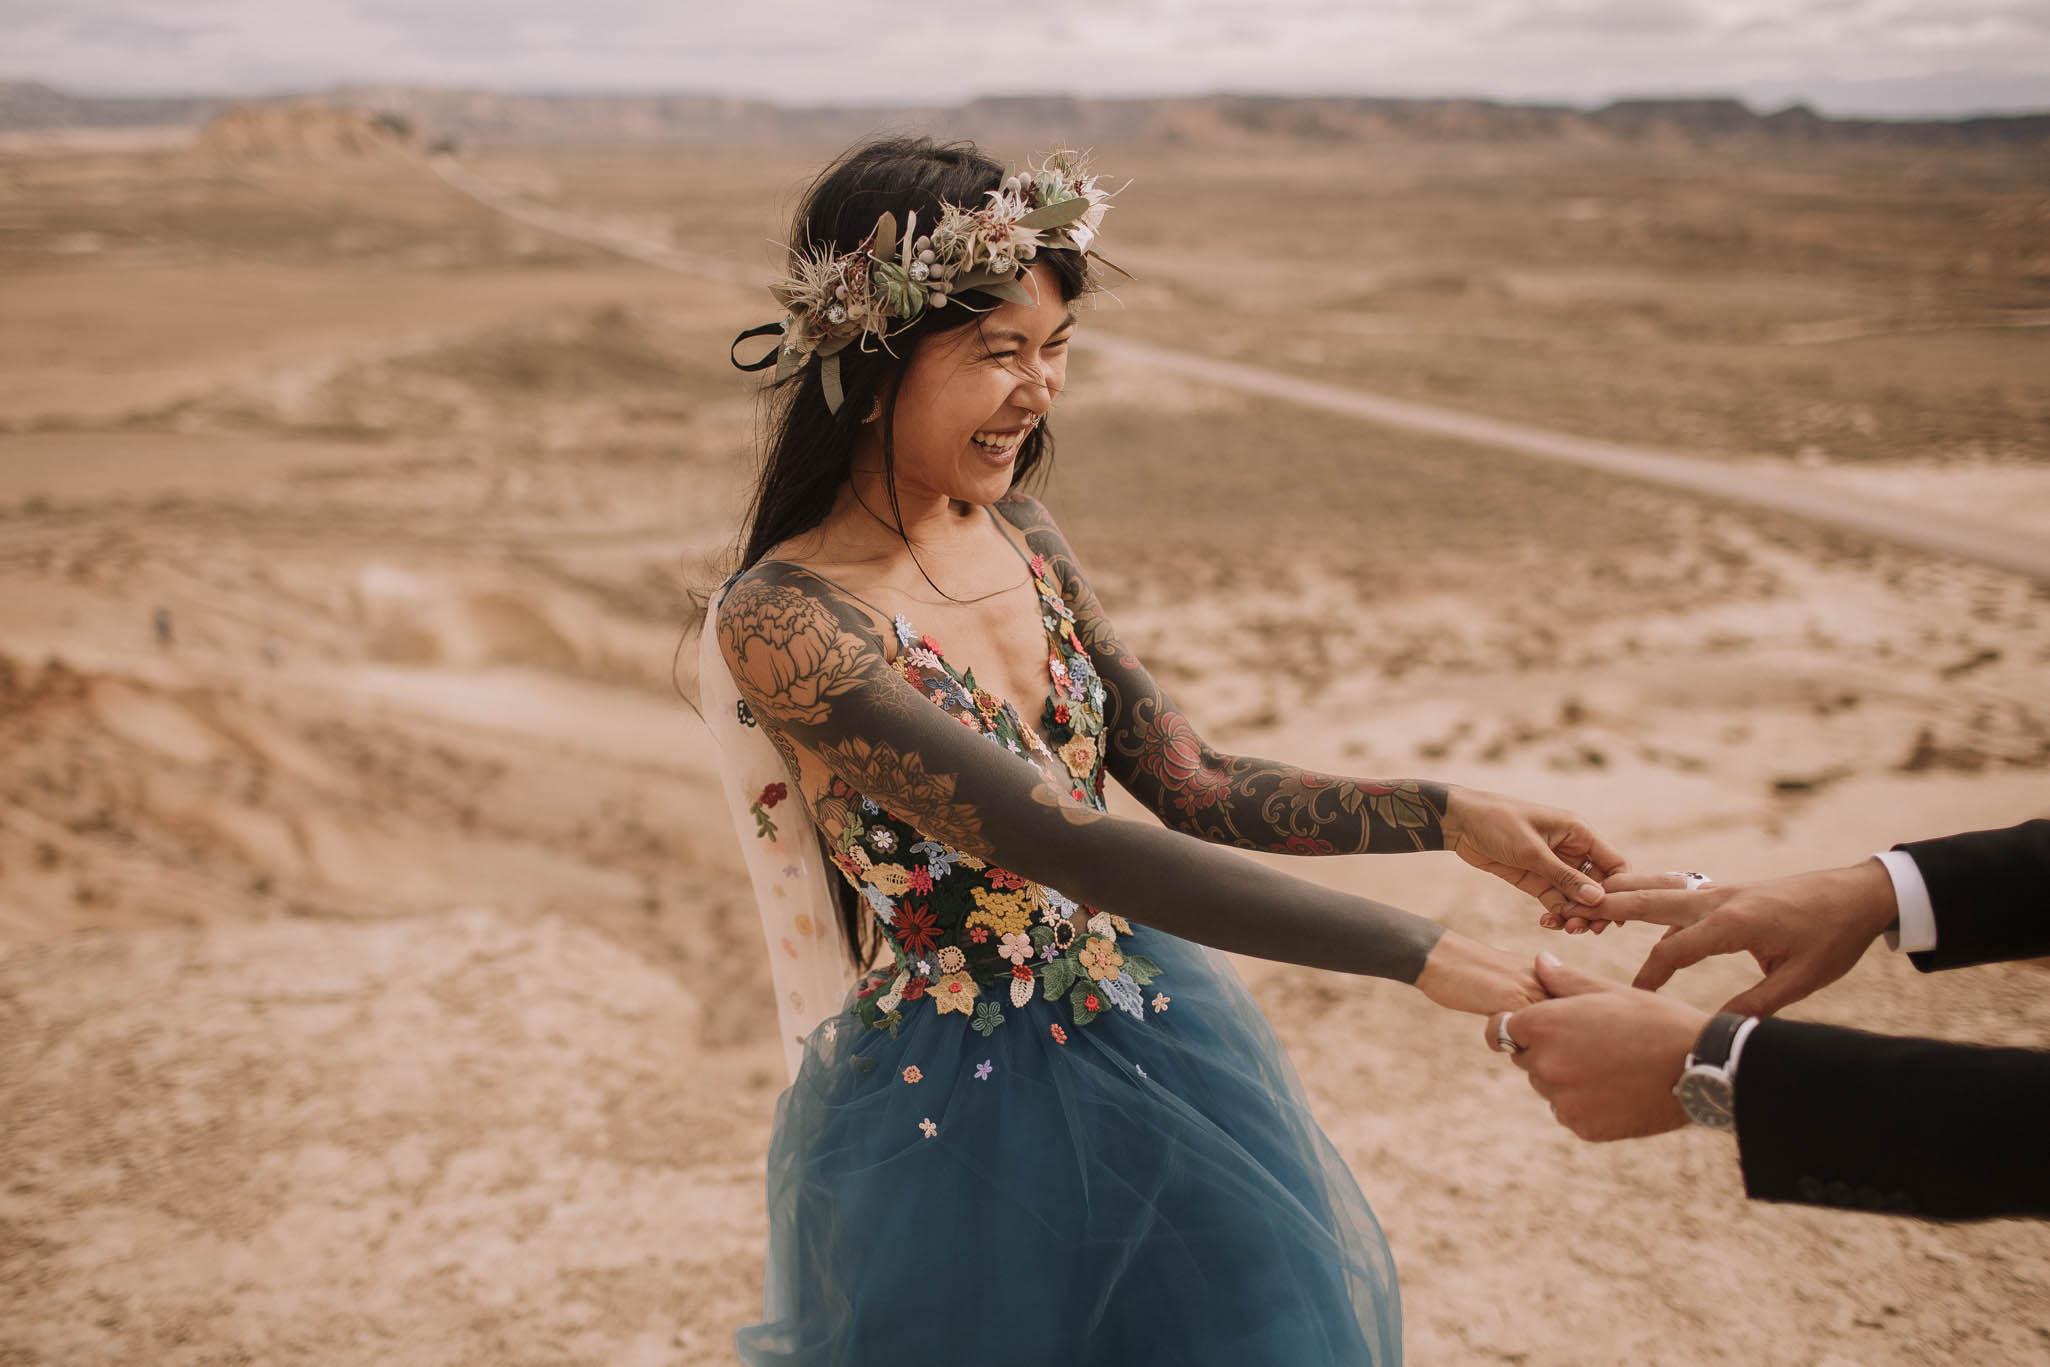 Spain-wedding-photographer-bardenas-reales-jeremy-boyer-photographe-mariage-bordeaux-floral-wedding-dress-robe-109.jpg